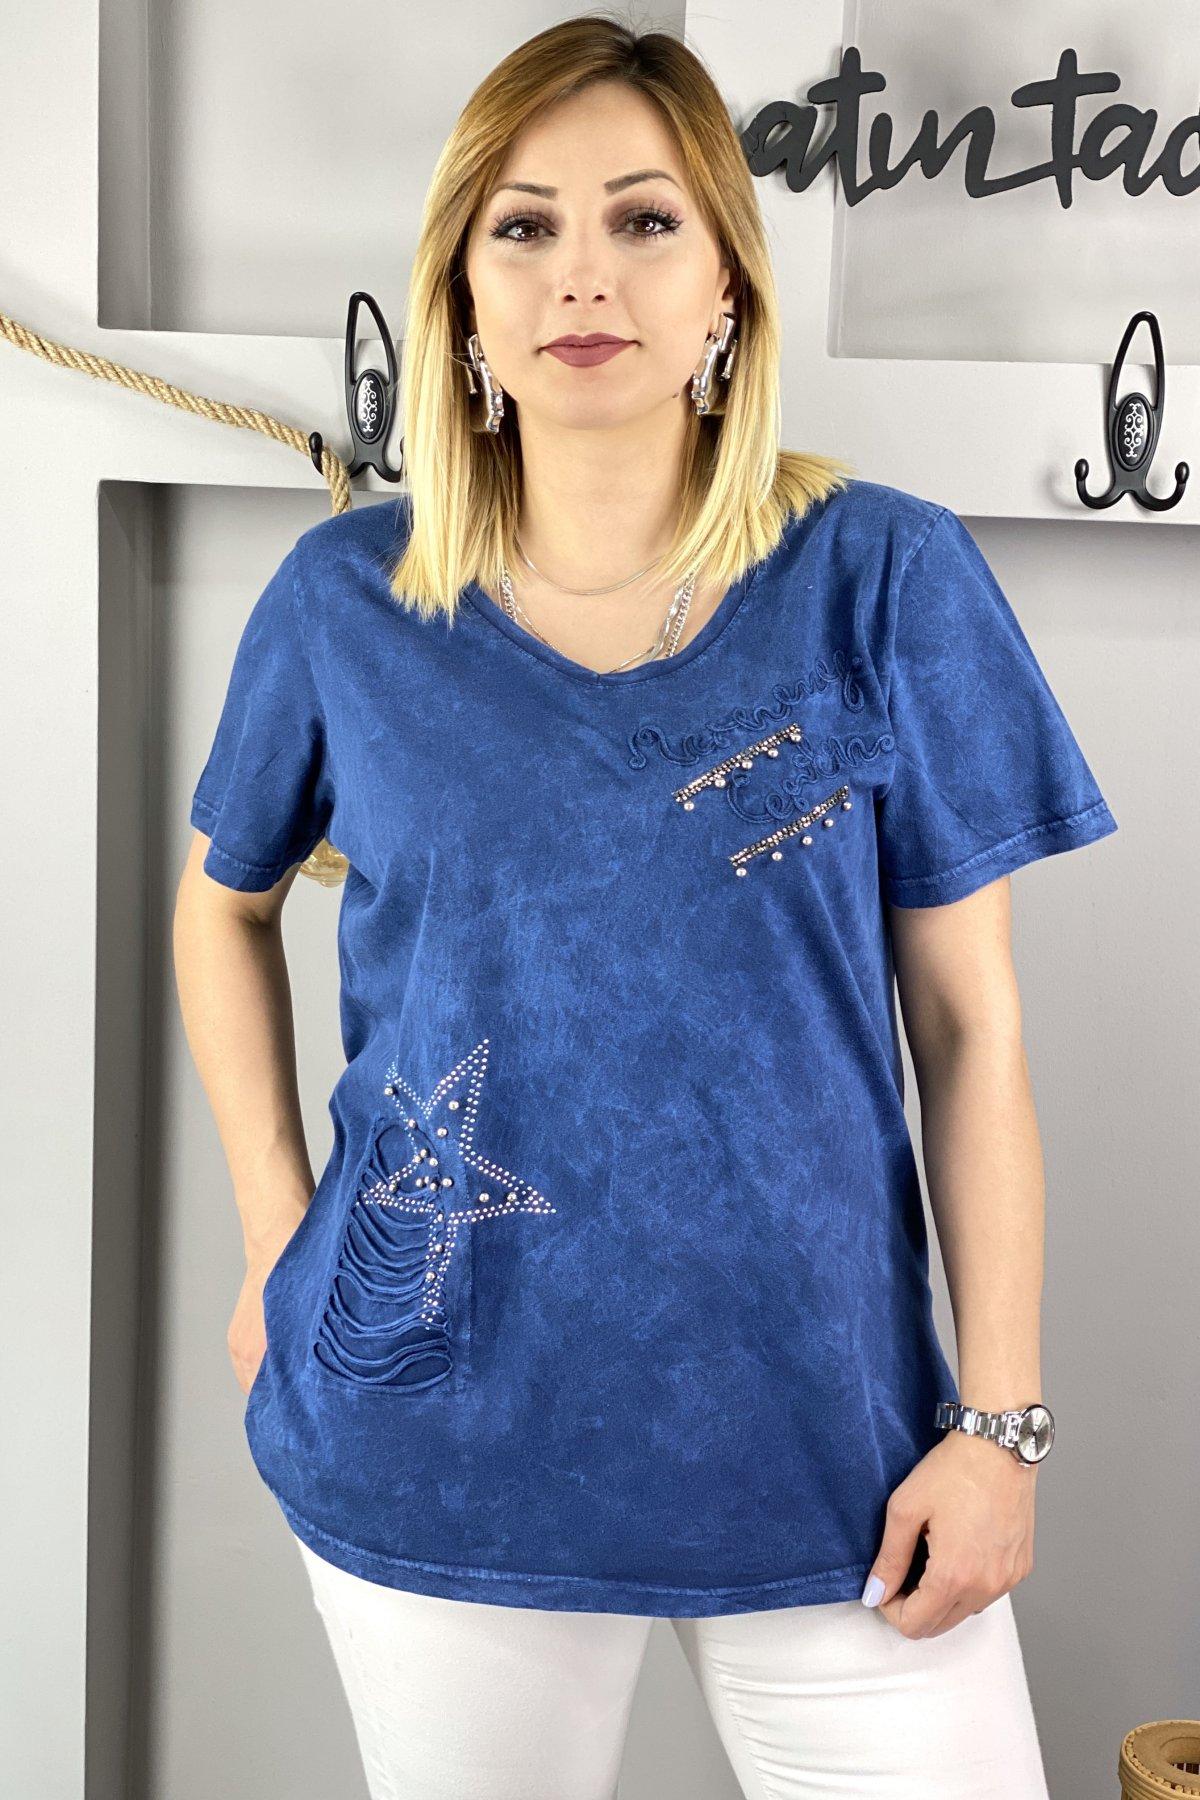 https://resim.chicbag.com.tr/p000669/lcv/sol-gogus-ustu-yazili-sag-tarafi-kesik-ustune-yildiz-detayli-v-yaka-kisa-kollu-t-shirt-01254e7e7a0b.jpg